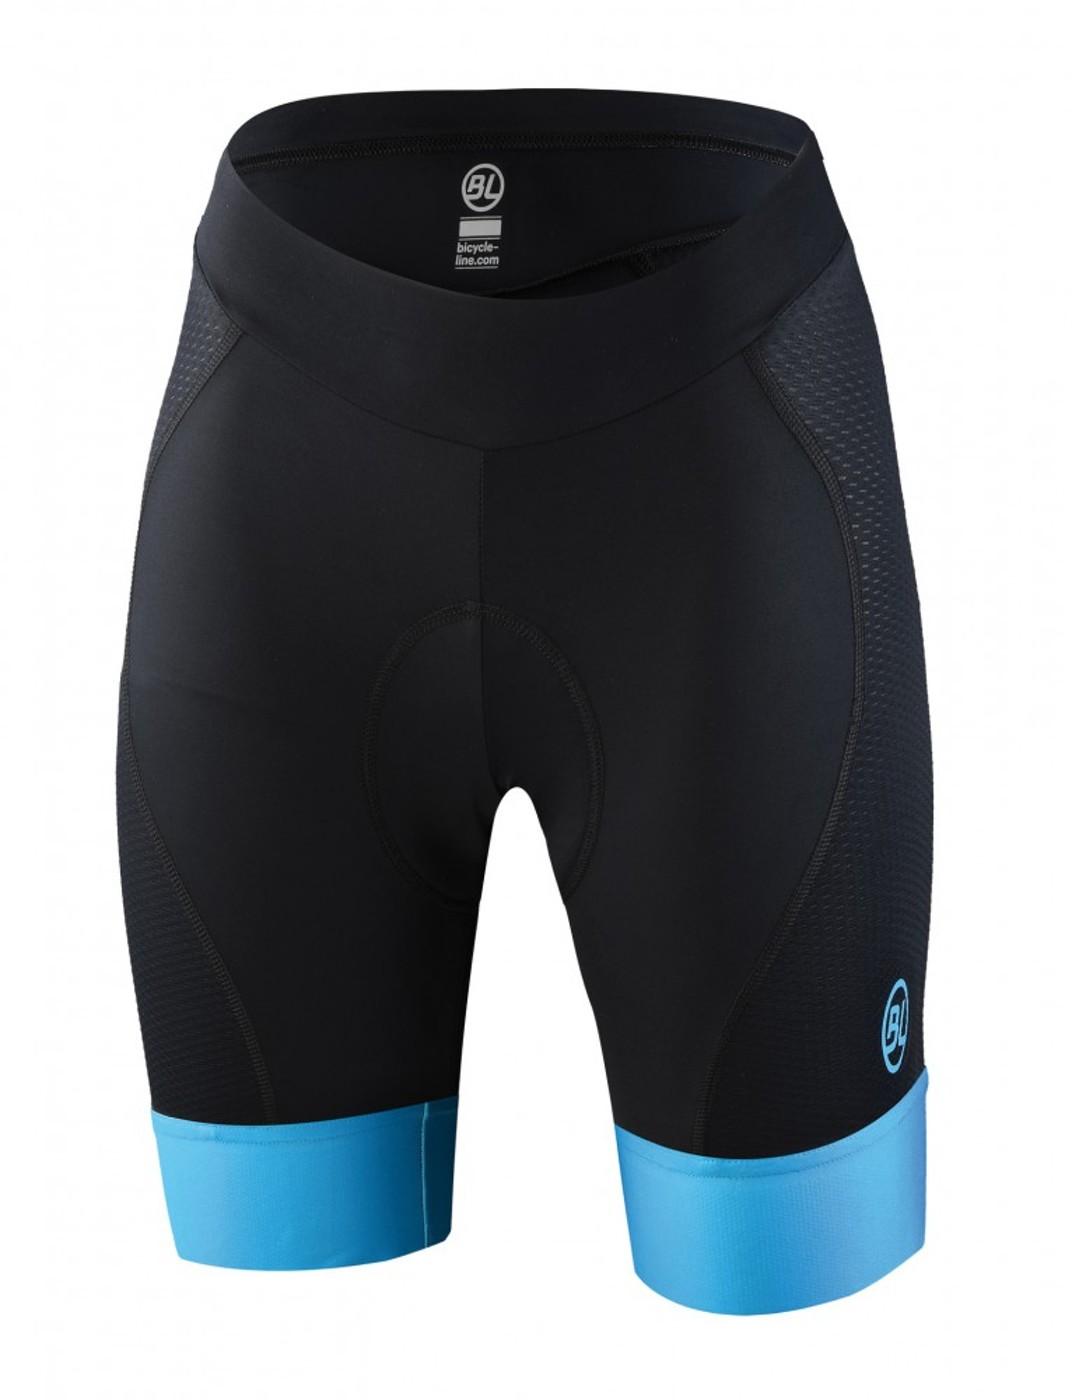 BICYCLE LINE SOLE Shorts - Damen